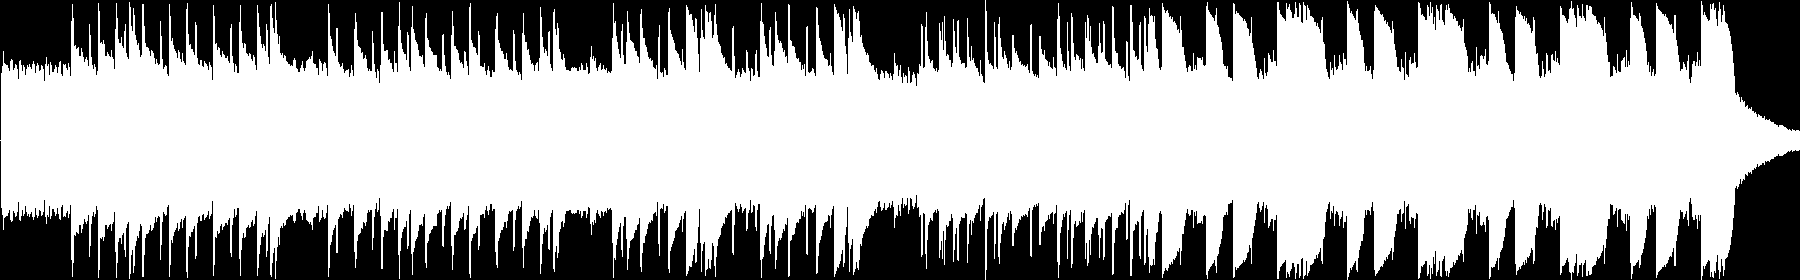 Libra Scale audio waveform